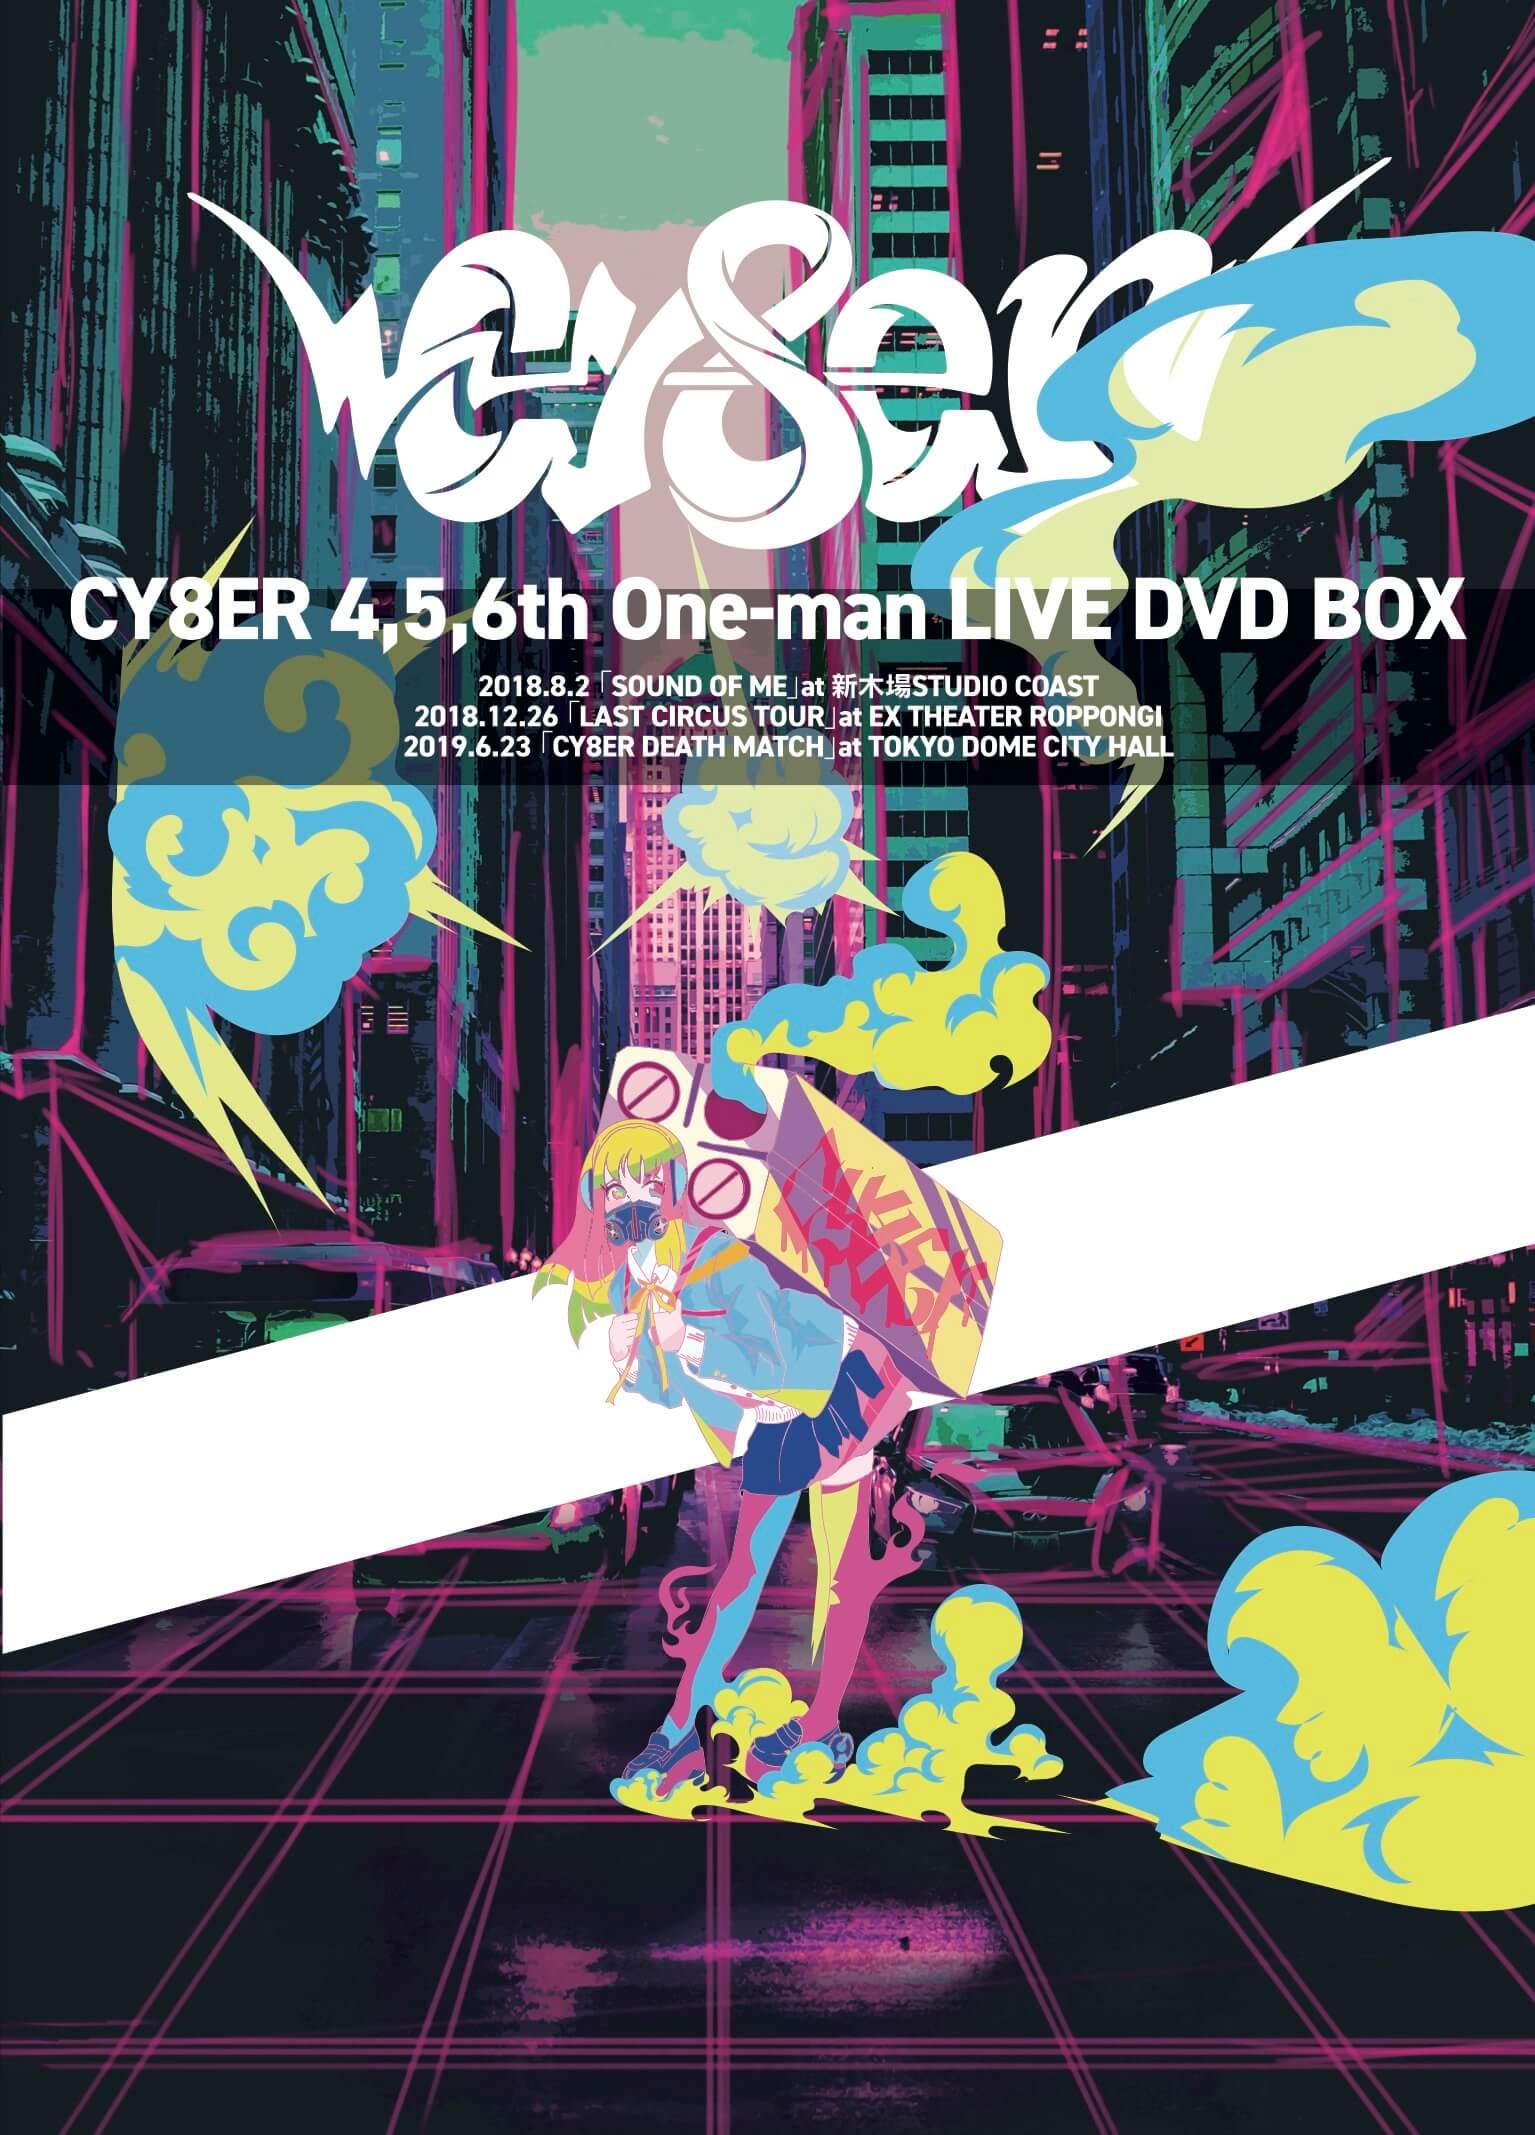 【DVDBOXジャケット絵柄ステッカー(全1種)】CY8ER/4,5,6th One-man LIVE DVD BOX